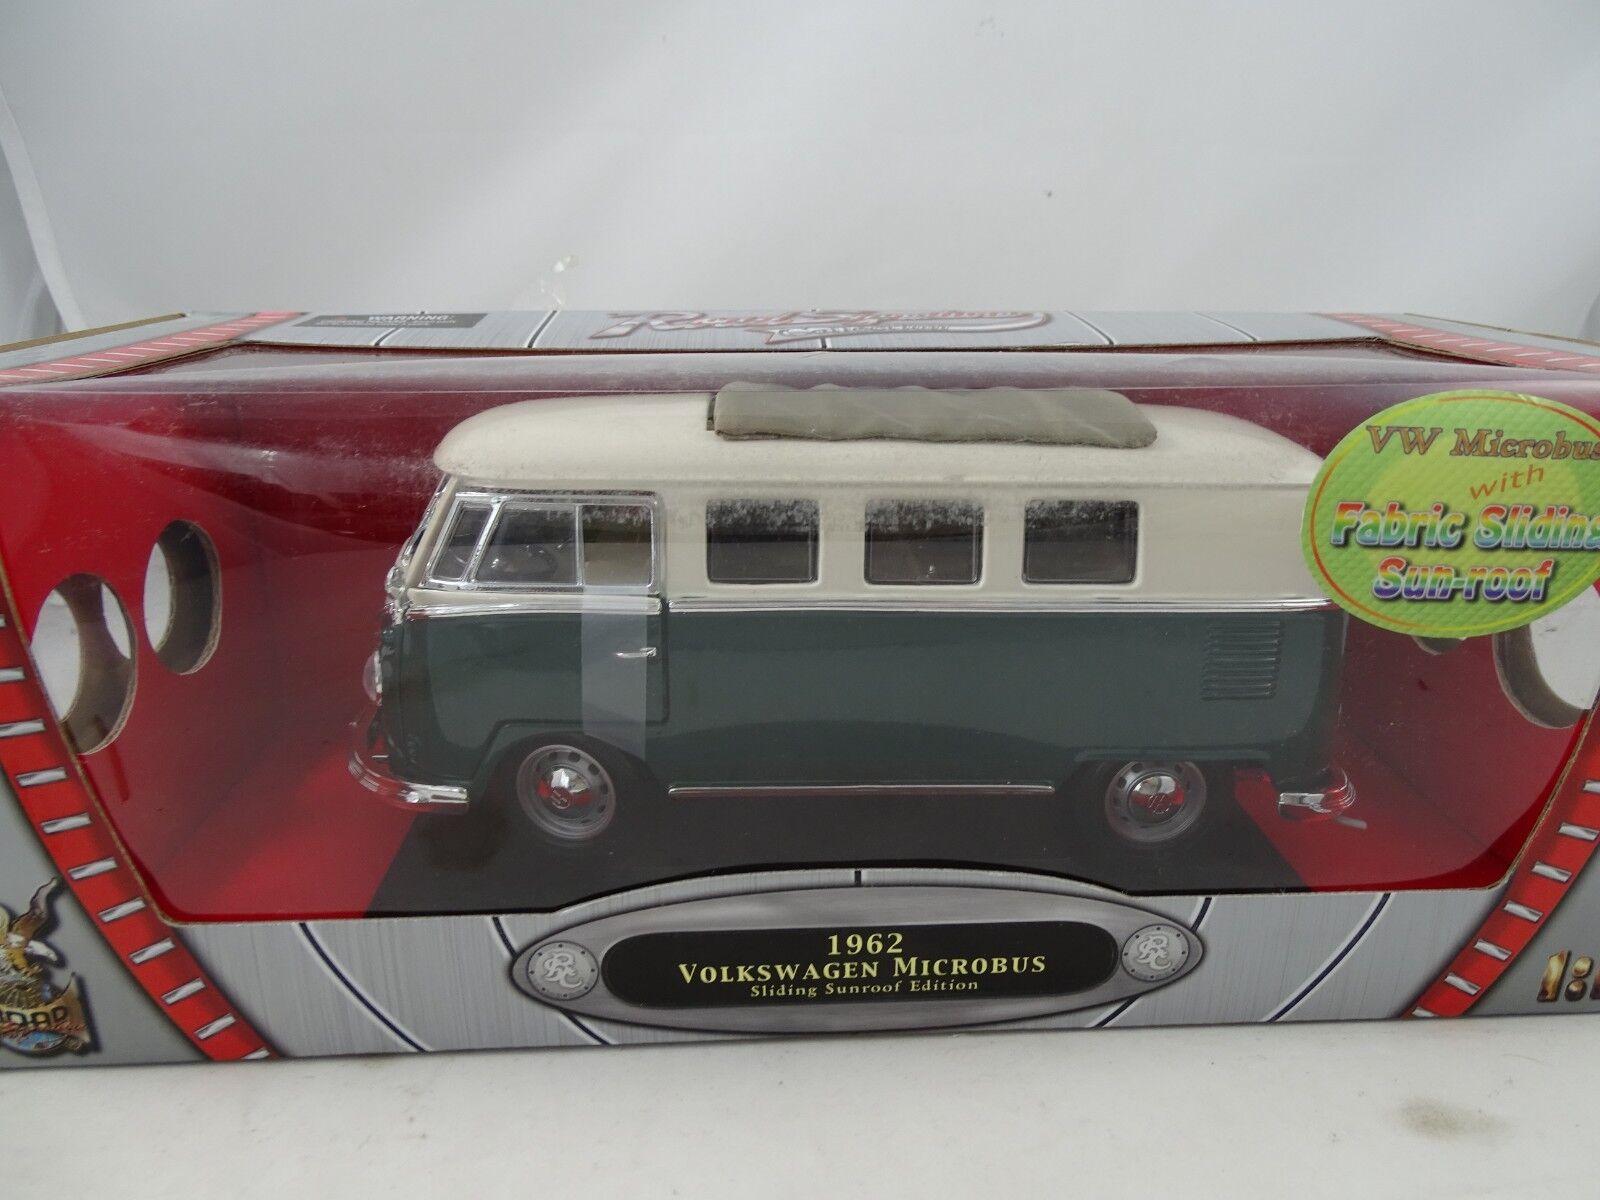 1 1 1 18 Road Signature 92327 1962 volkswagen microbus sliding sunroof verde rareza d68e34